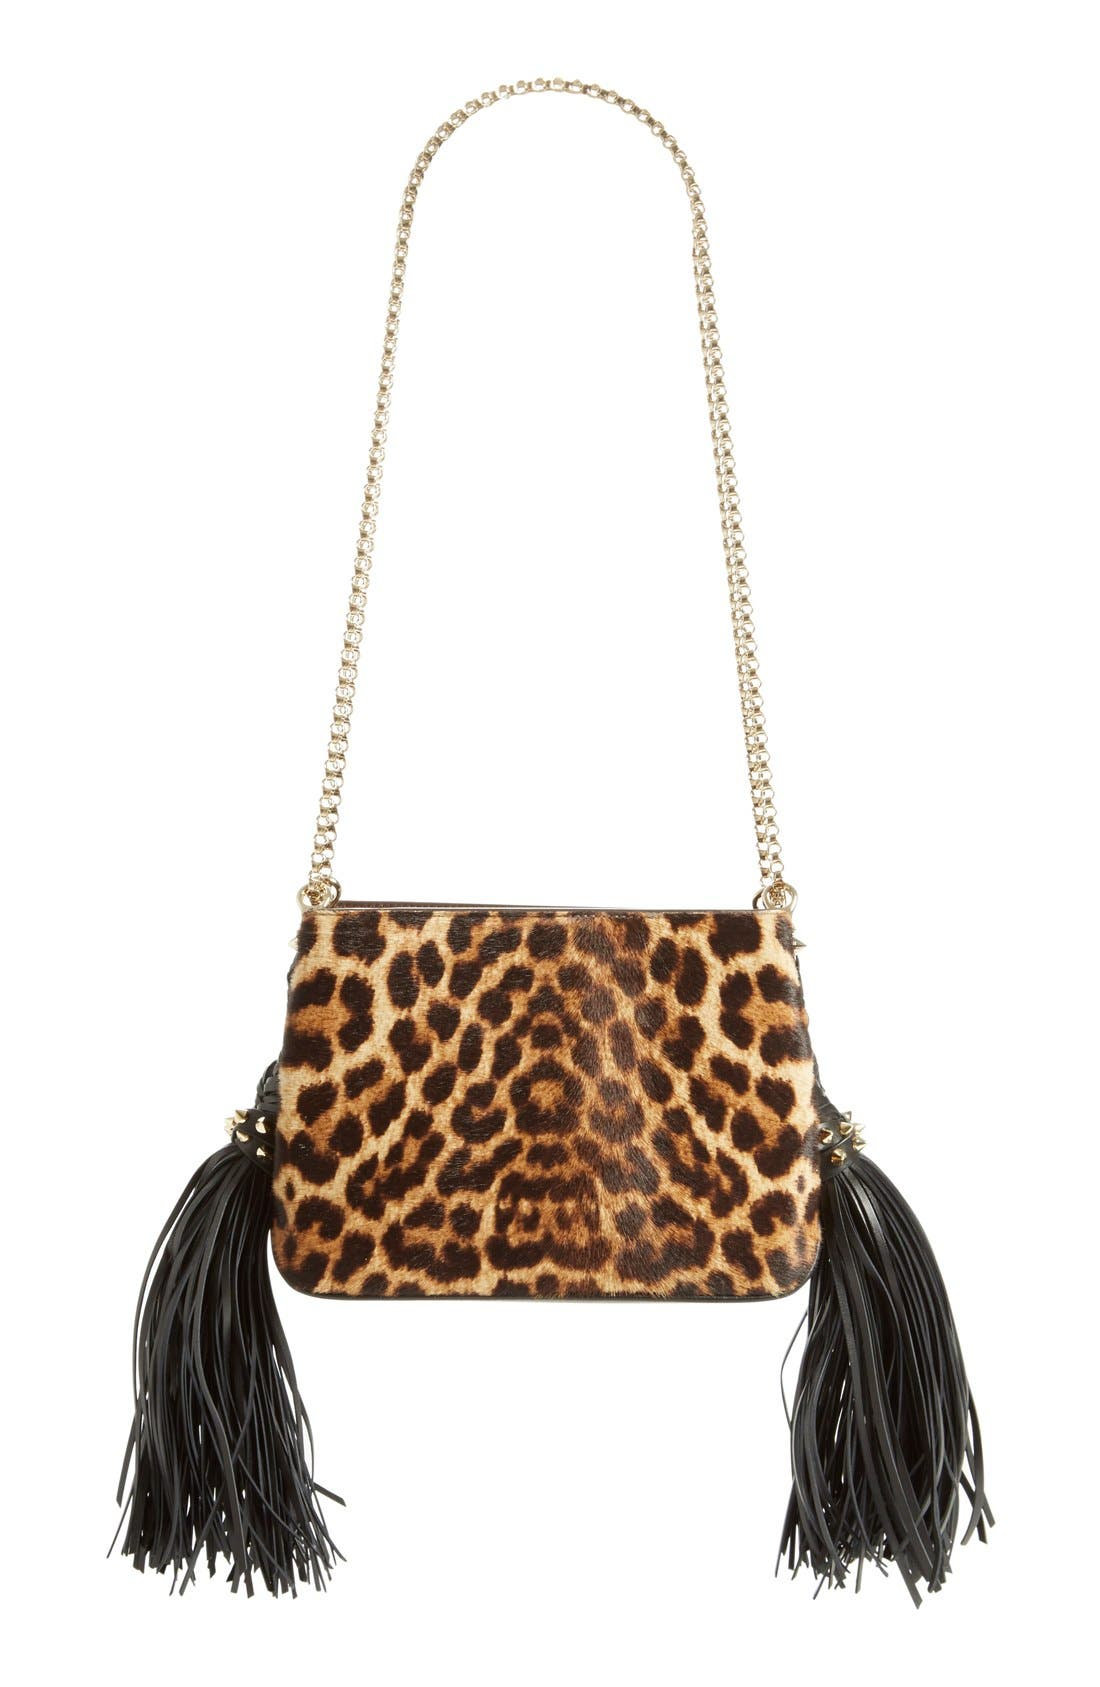 Alternate Image 1 Selected - Christian Louboutin 'Small Triloubi' Leopard Print Calf Hair Handbag